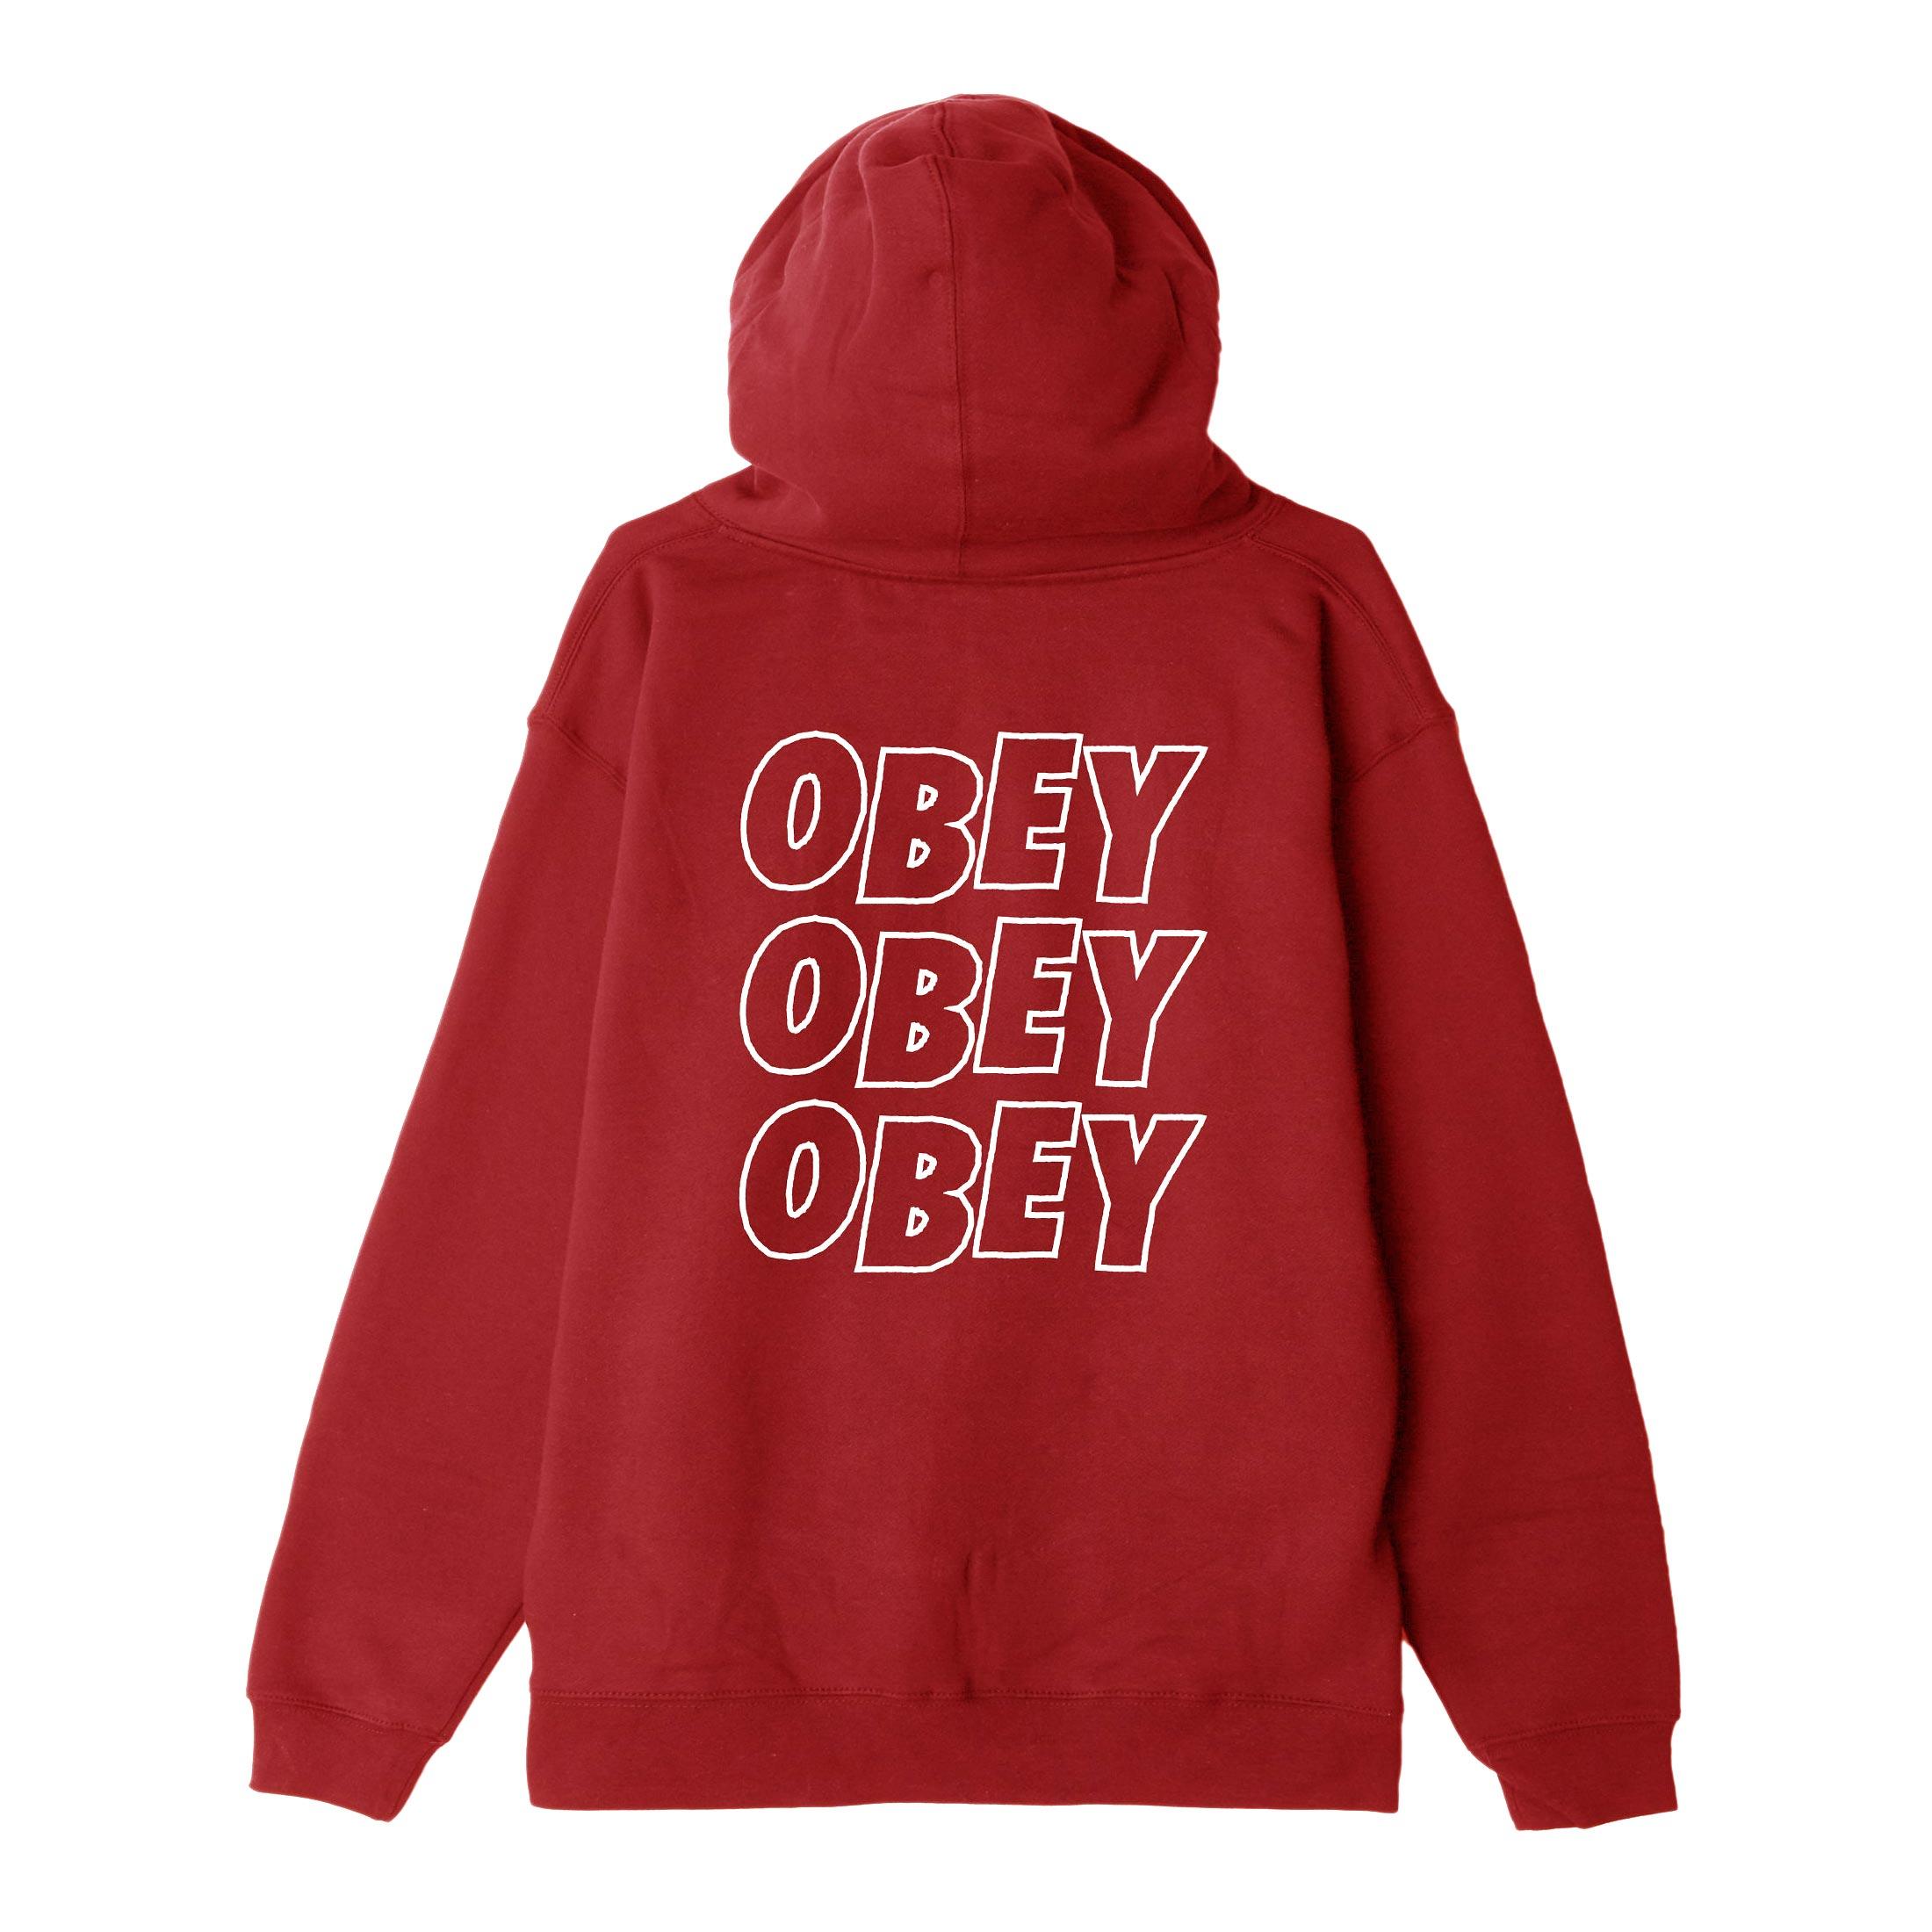 obey_red.jpg